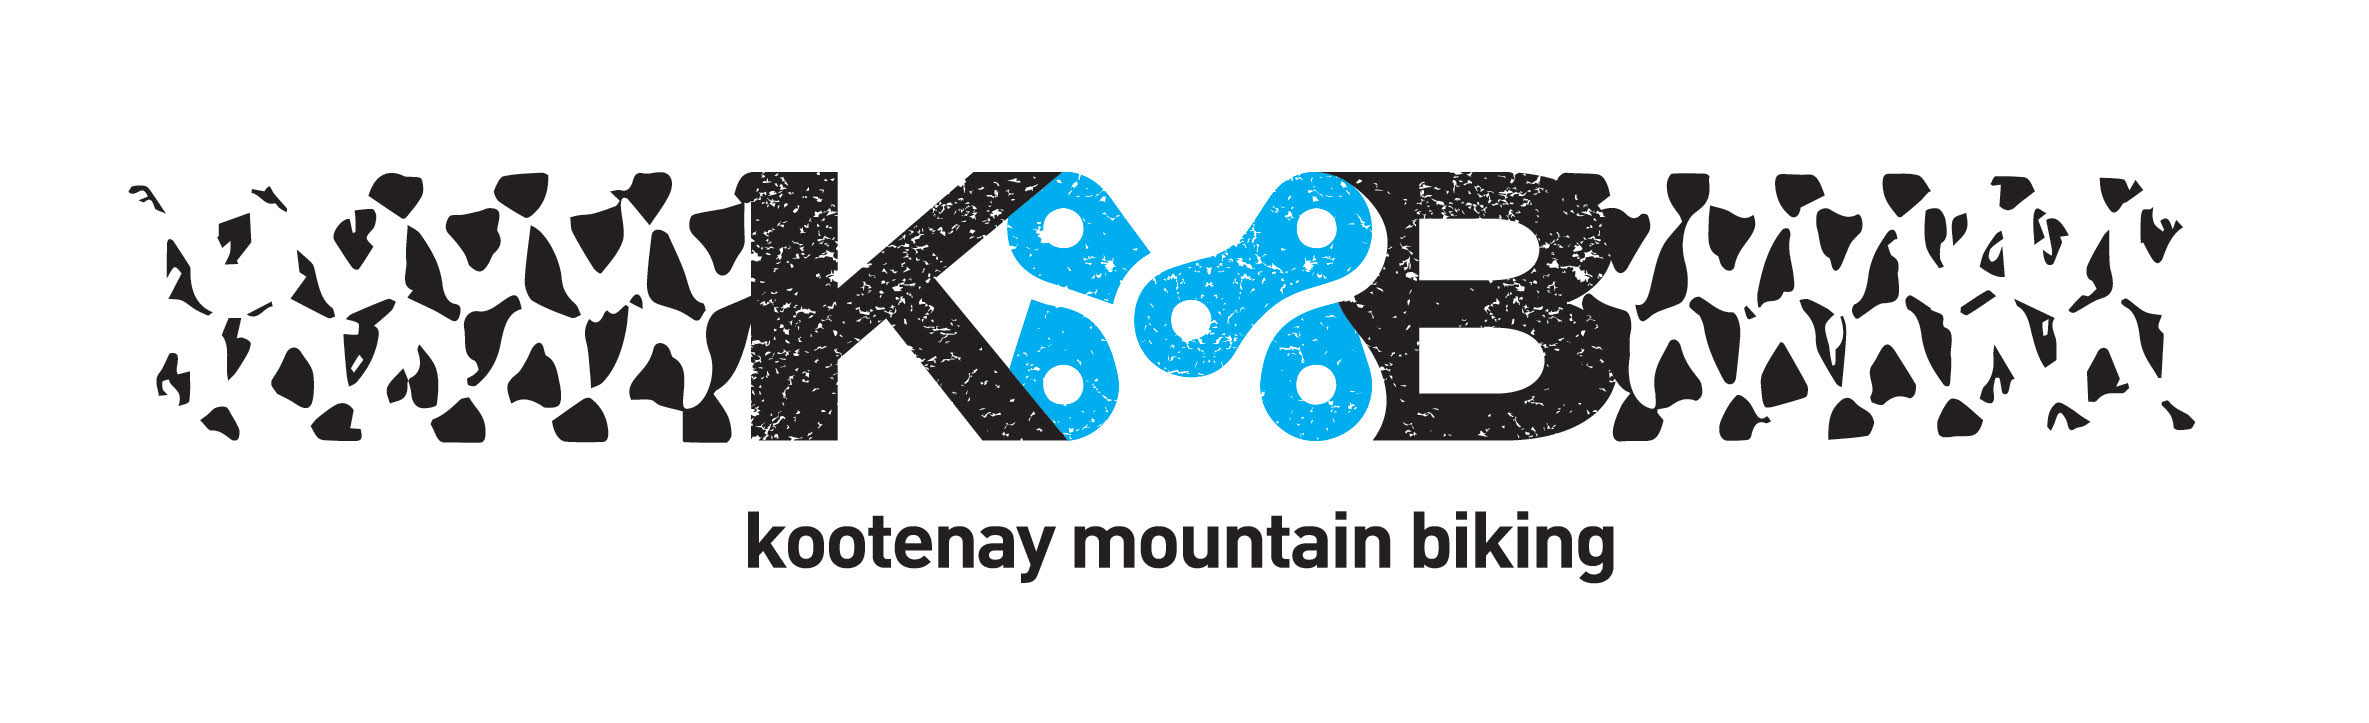 Kootney Mountain Biking